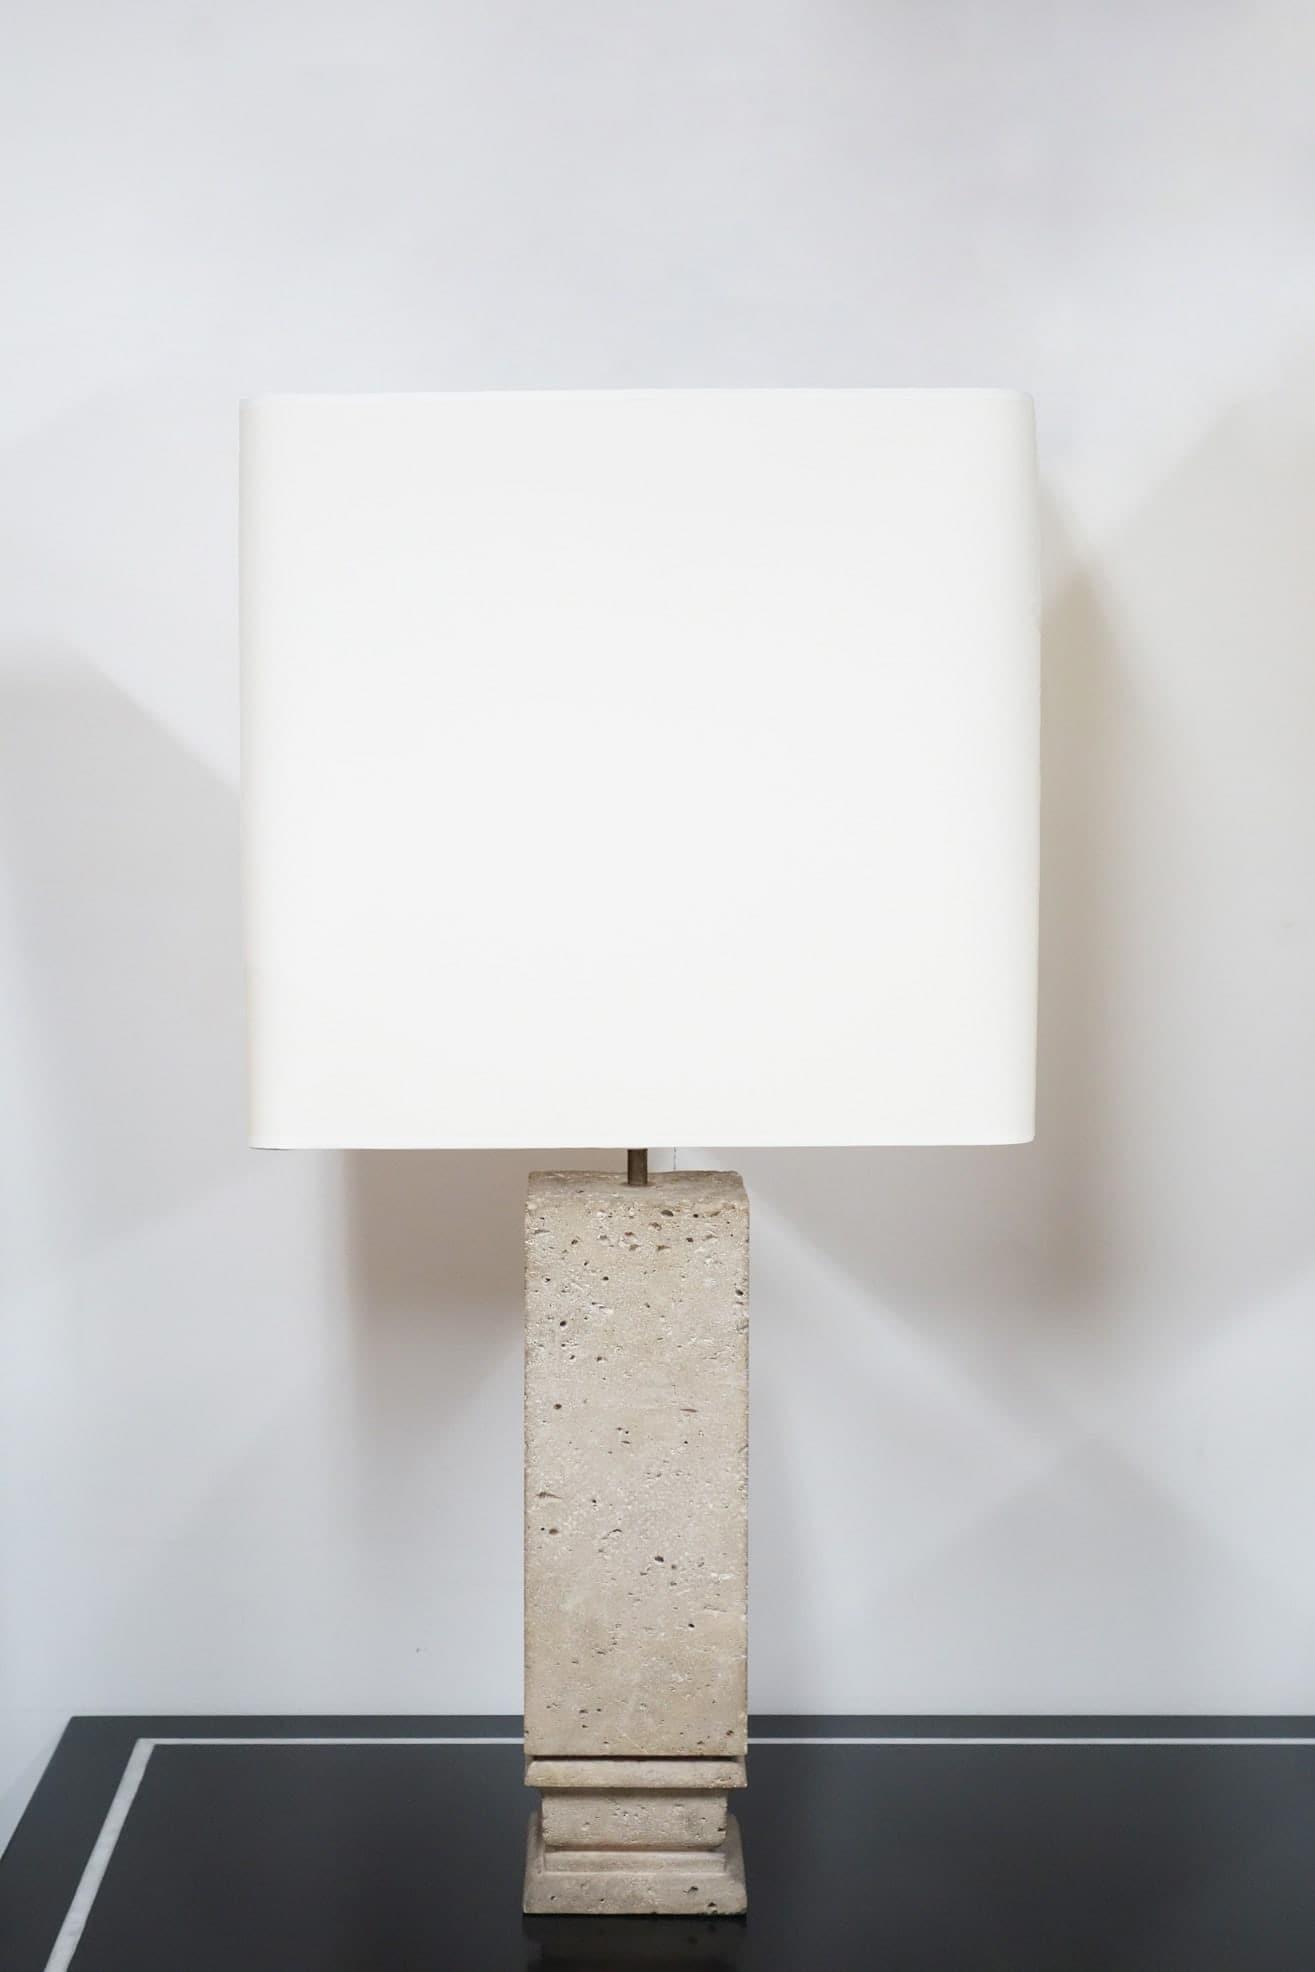 Jean-Charles Moreux, Pair of lamps, vue 02